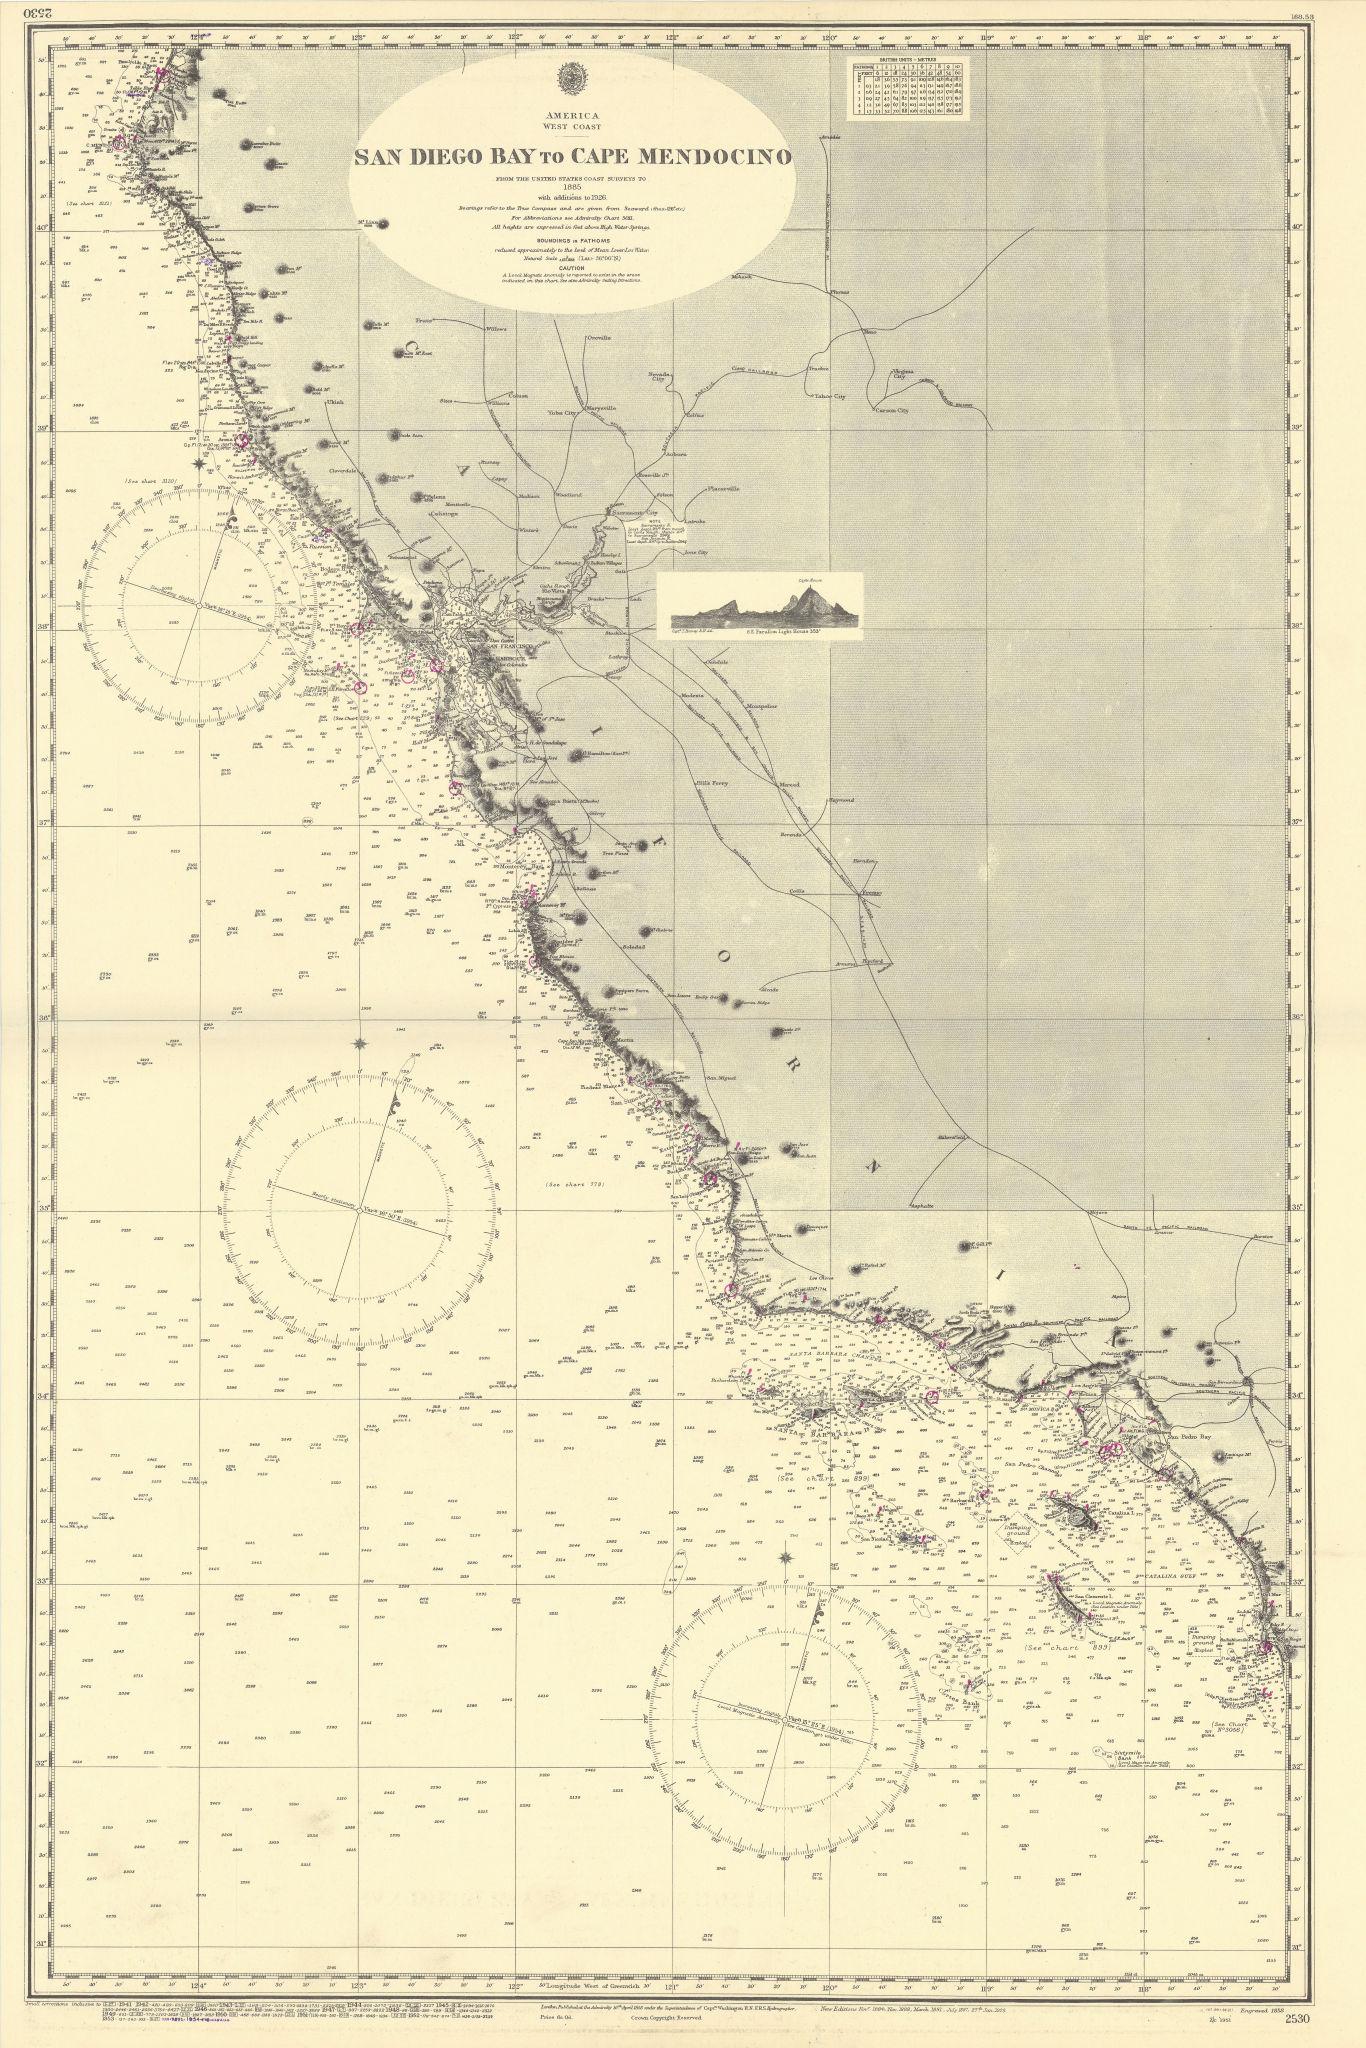 California coast. San Diego-Cape Mendocino ADMIRALTY sea chart 1858 (1954) map